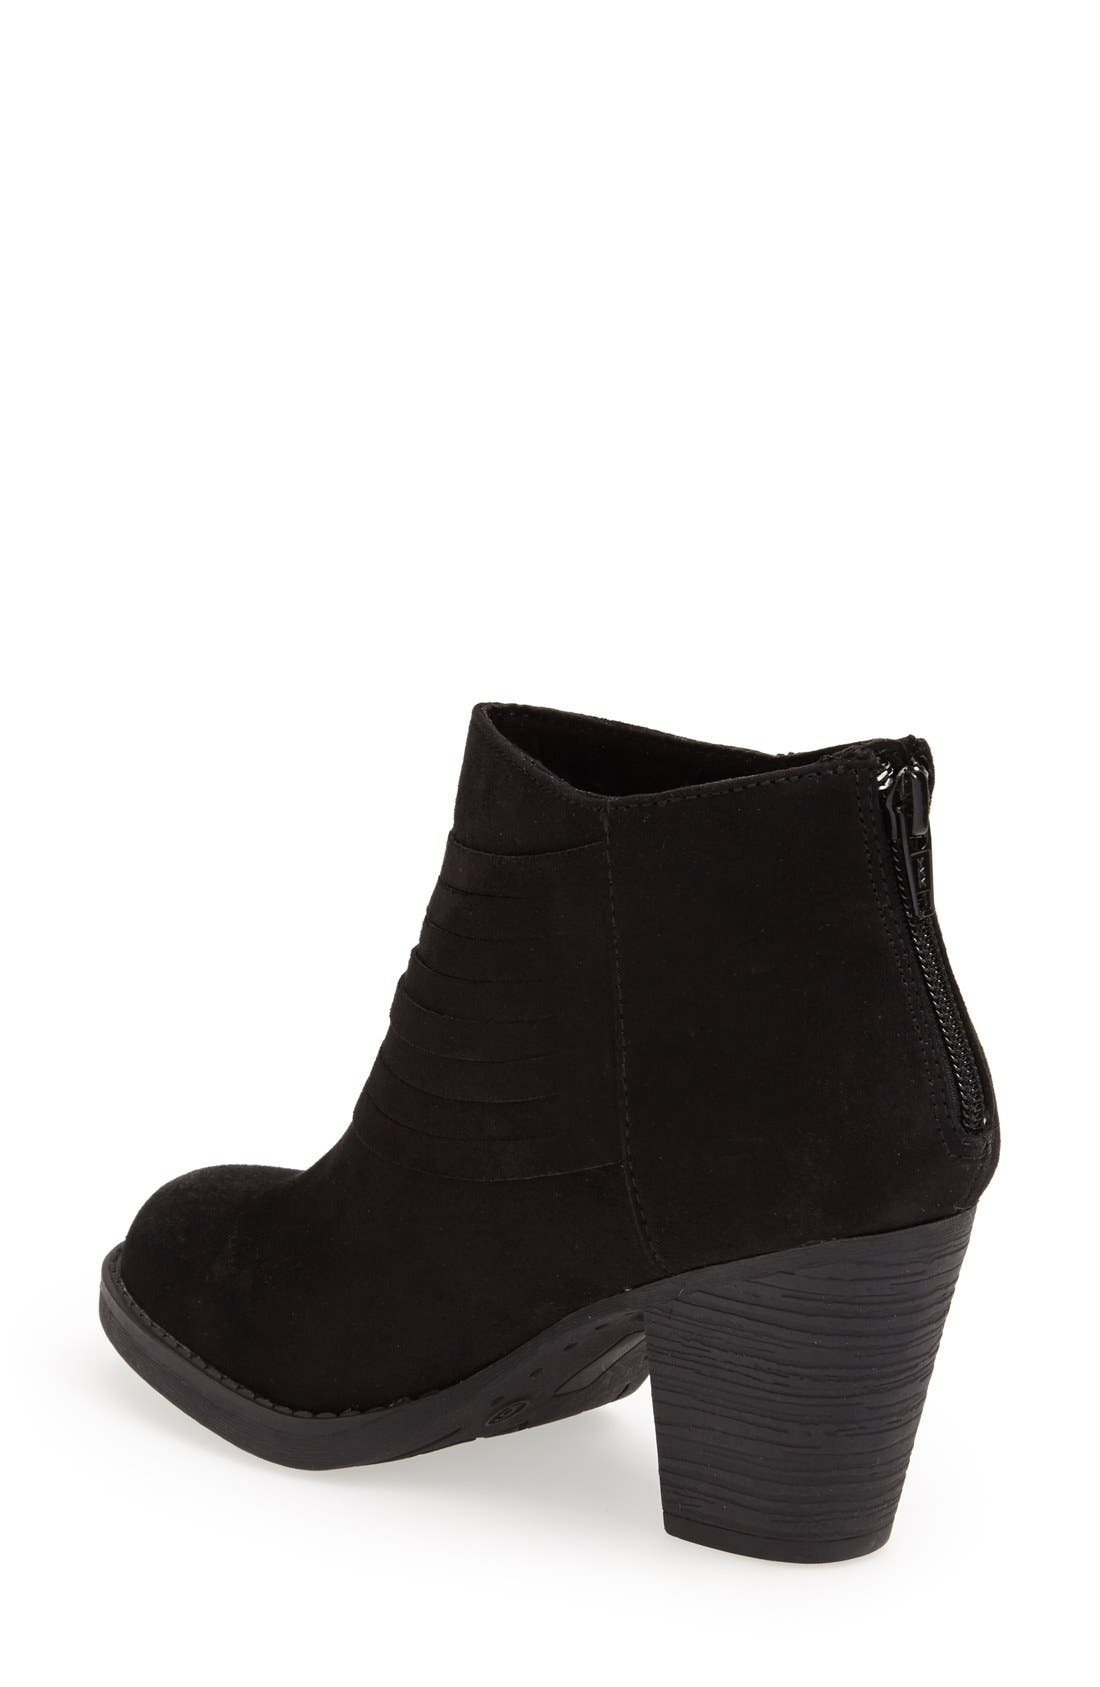 Alternate Image 2  - BC Footwear 'Best Dressed' Bootie (Women)